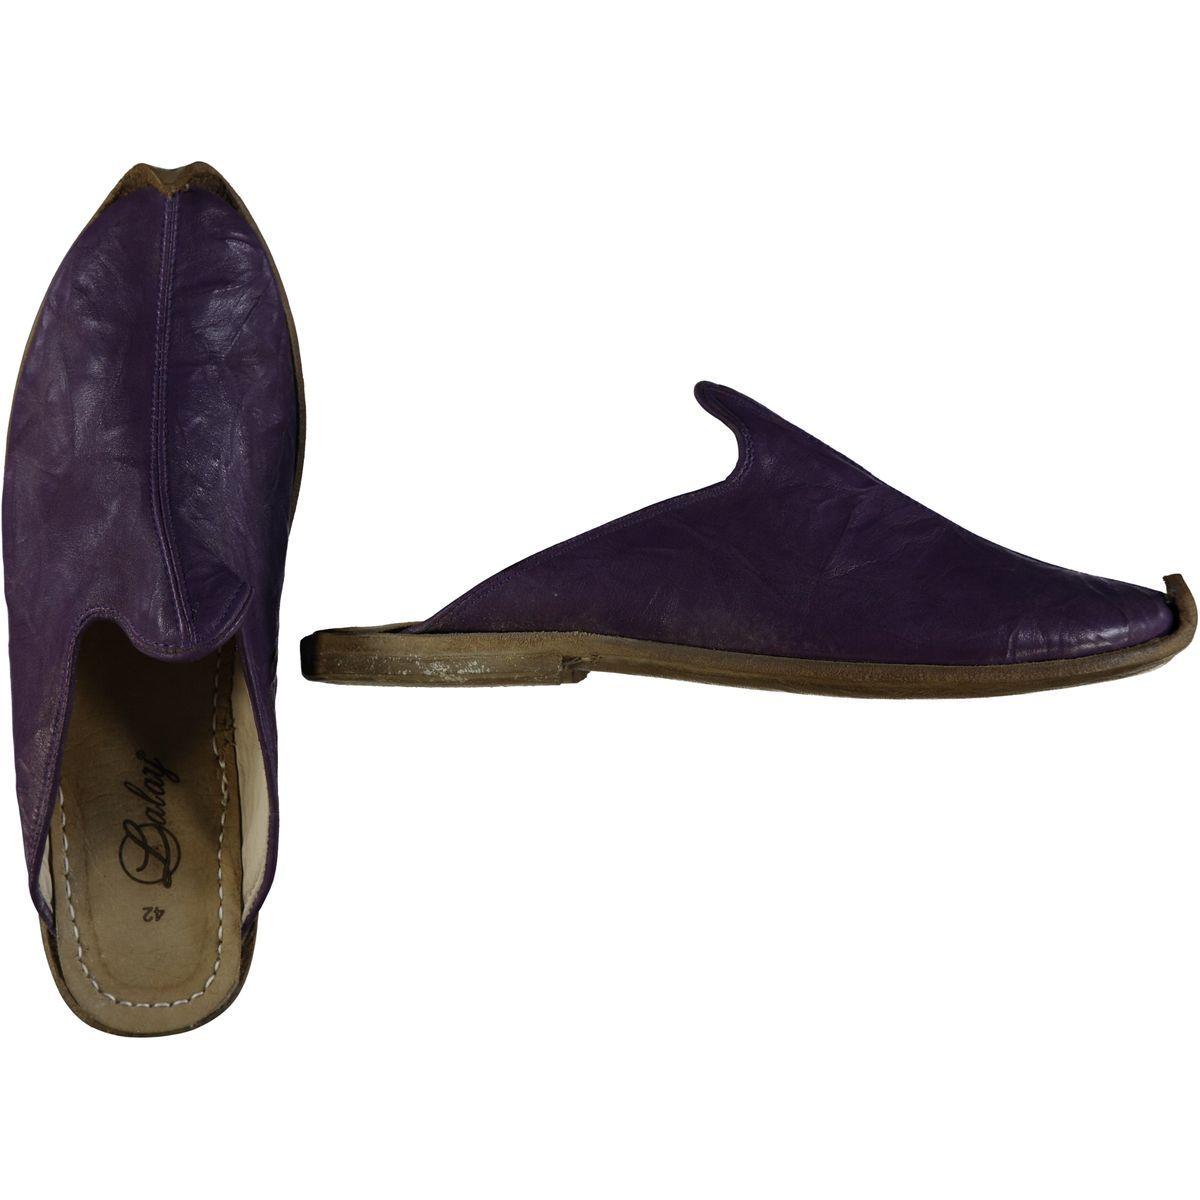 Slipper - Babouche - Leather / Handmade - Dark Purple